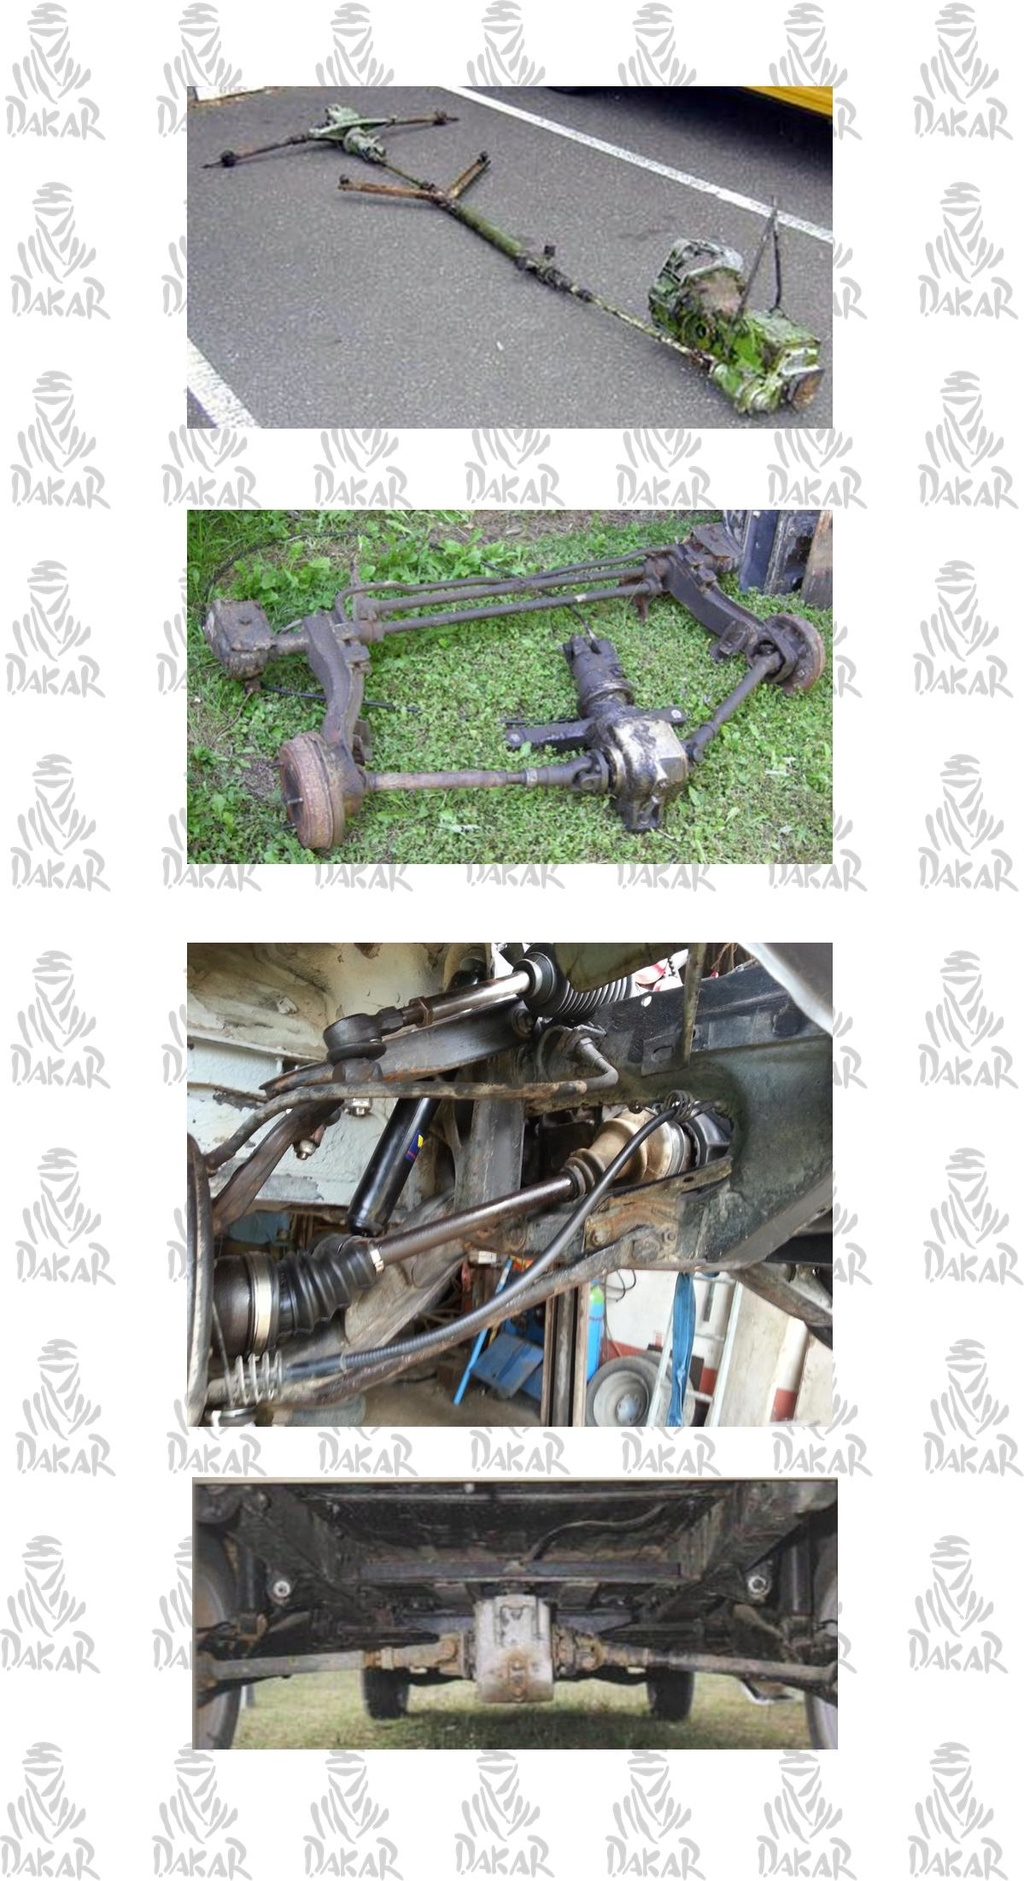 [1/24]Renault 4 l dakar 1980 Ref 80759 1911